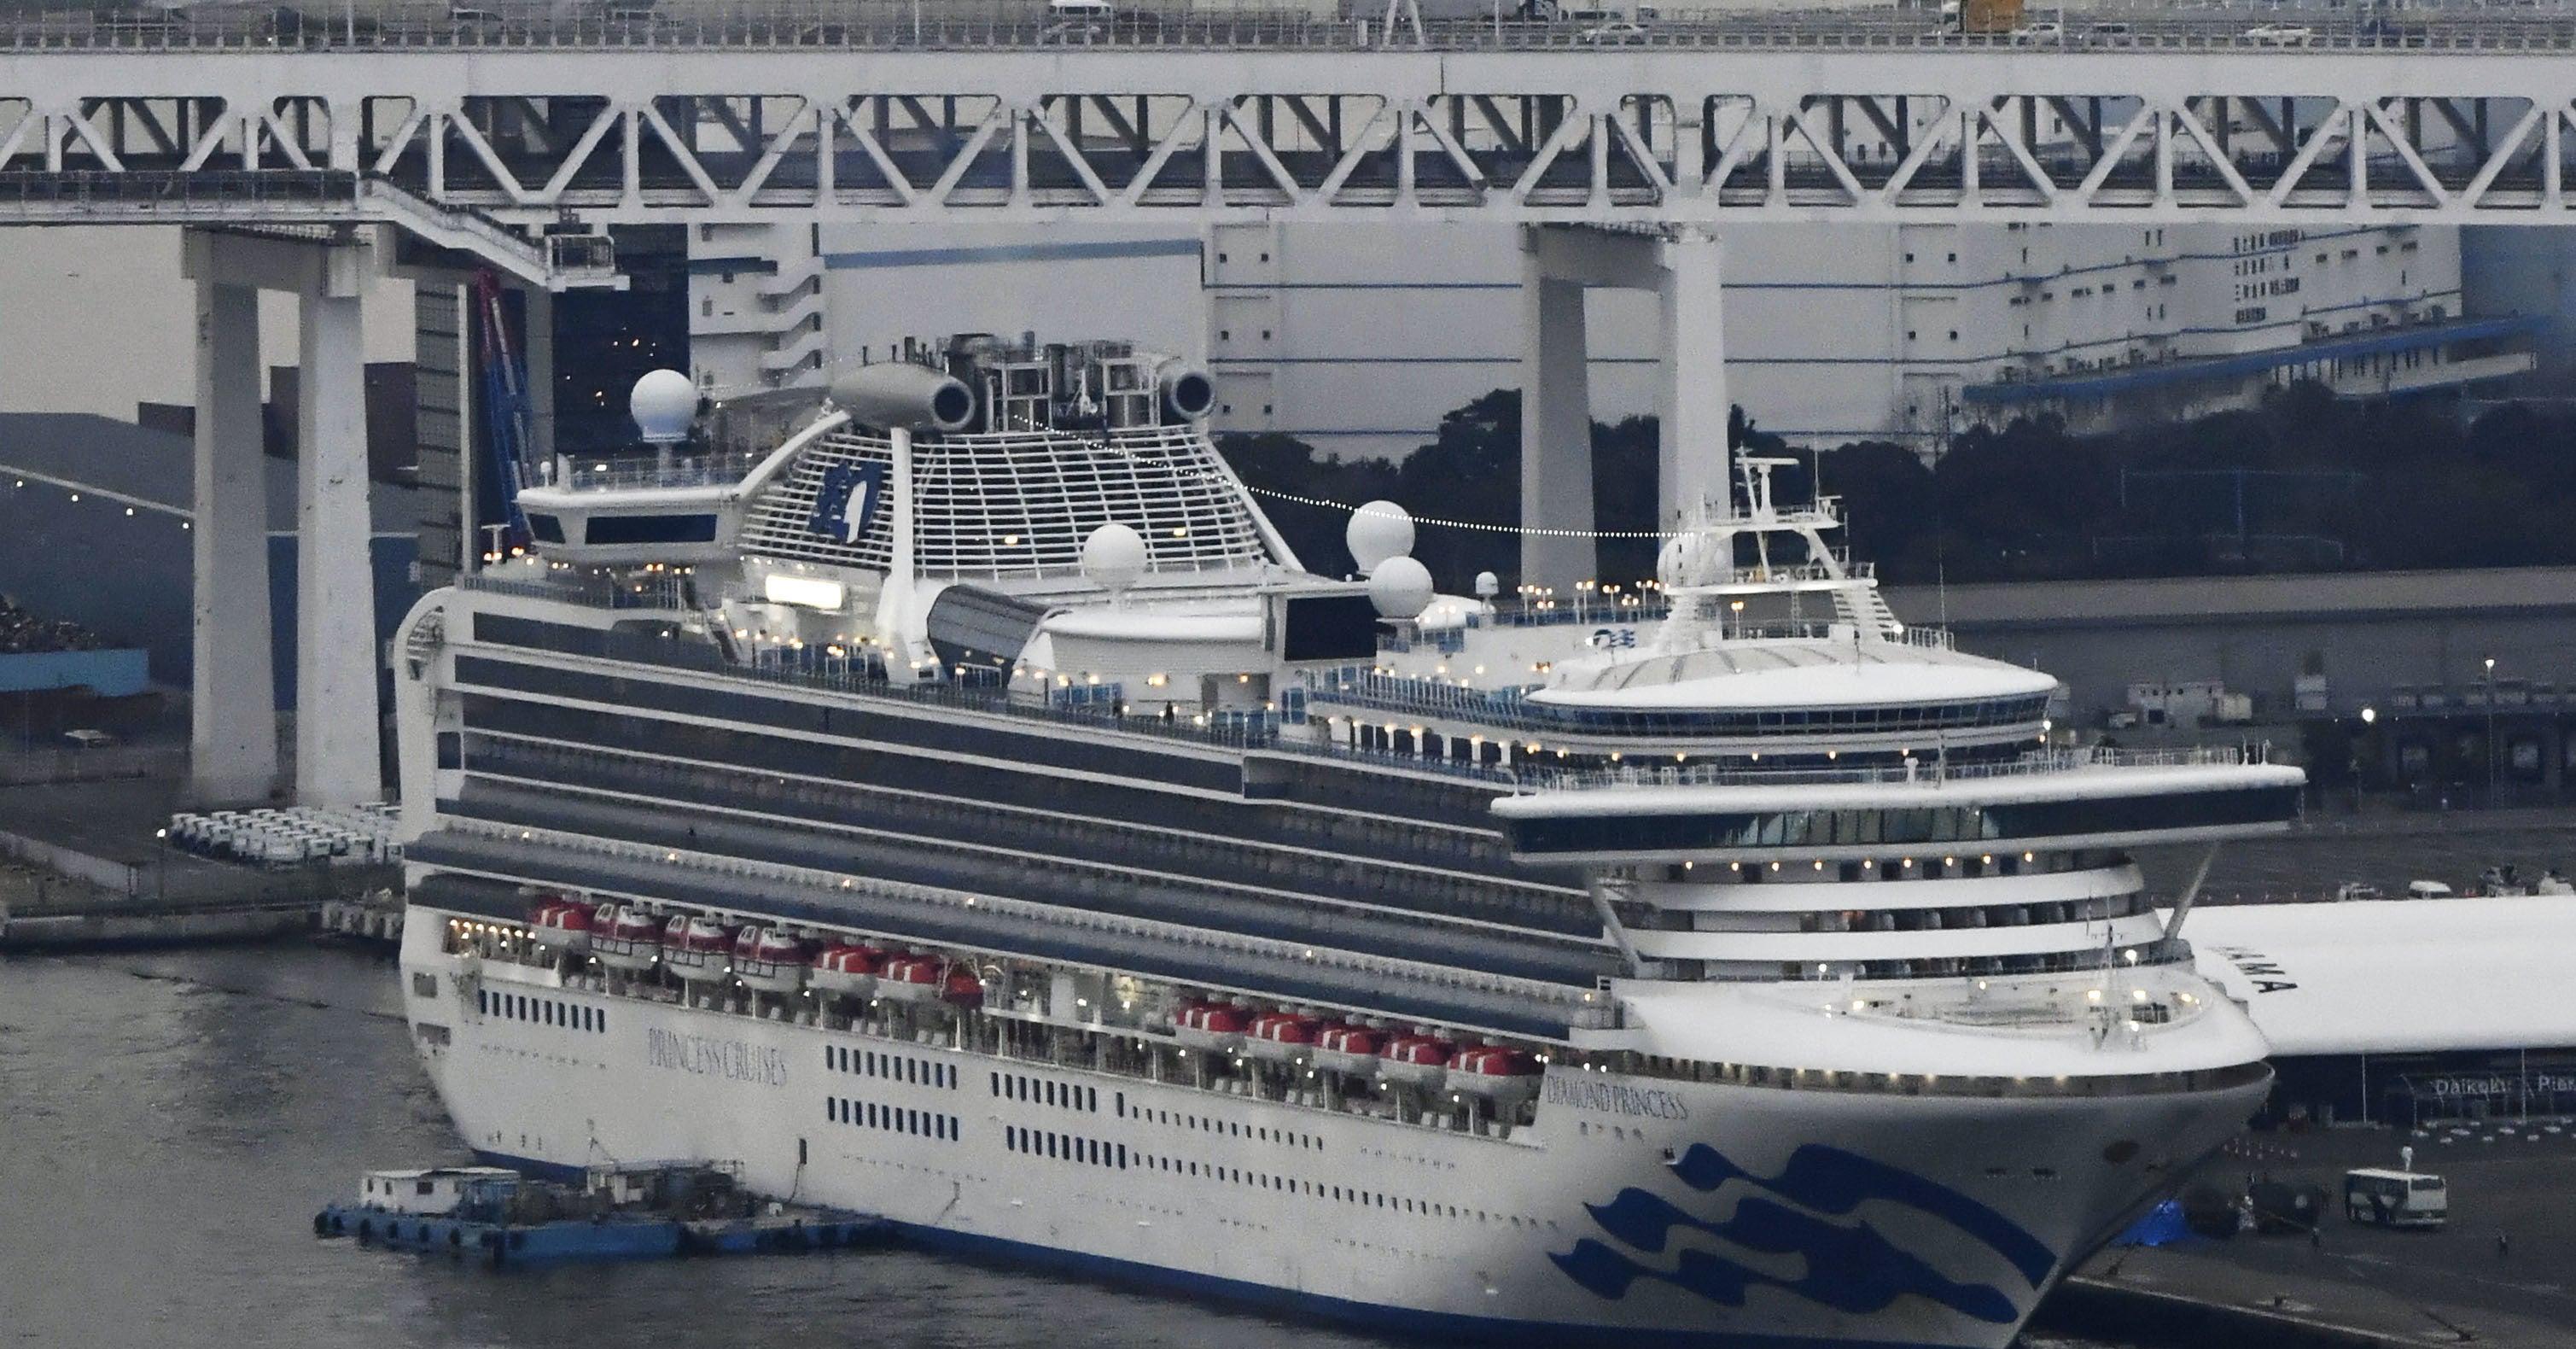 The Coronavirus Cruise Ship Quarantine Gave The Virus An Efficient Way To Spread, Experts Say